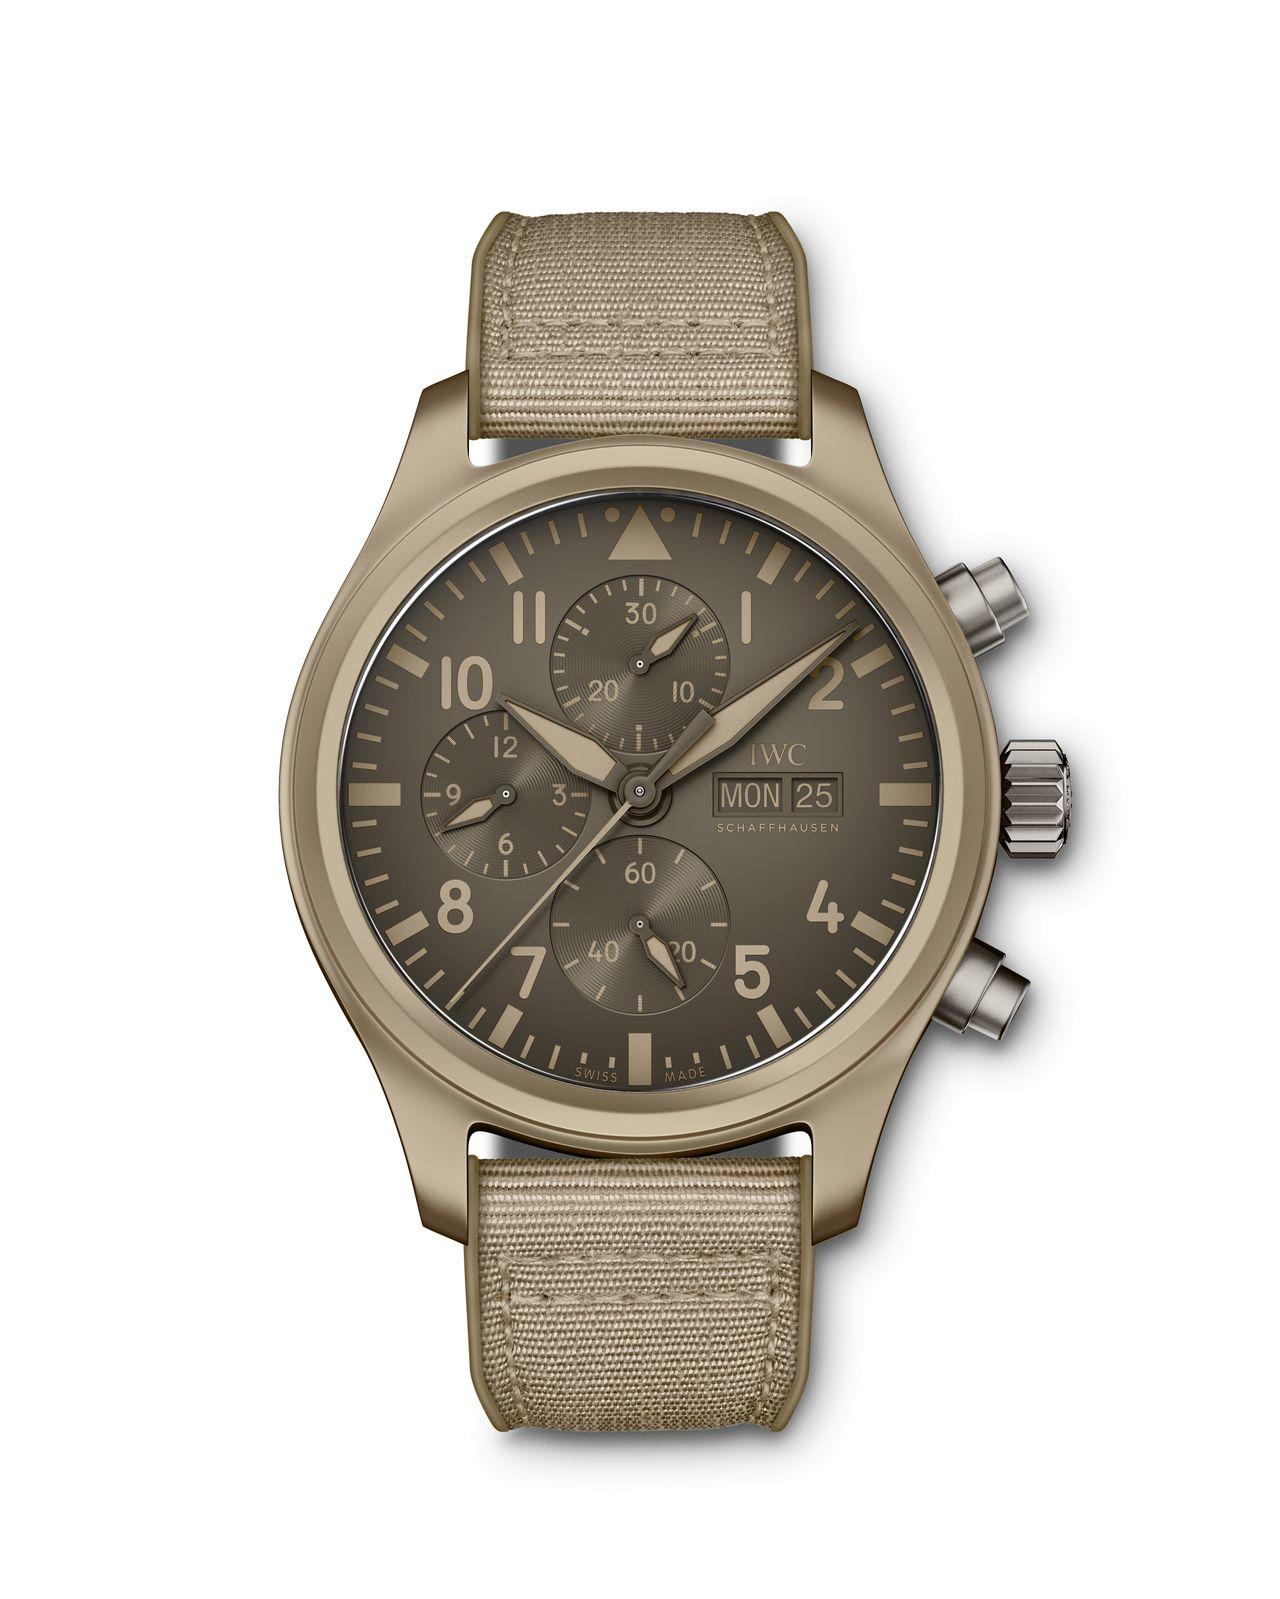 "IWC Pilot's Watch Chronograph TOP GUN Edition ""Mojave Desert"" - lassan évszázados formatervezési elvek, mégis friss"